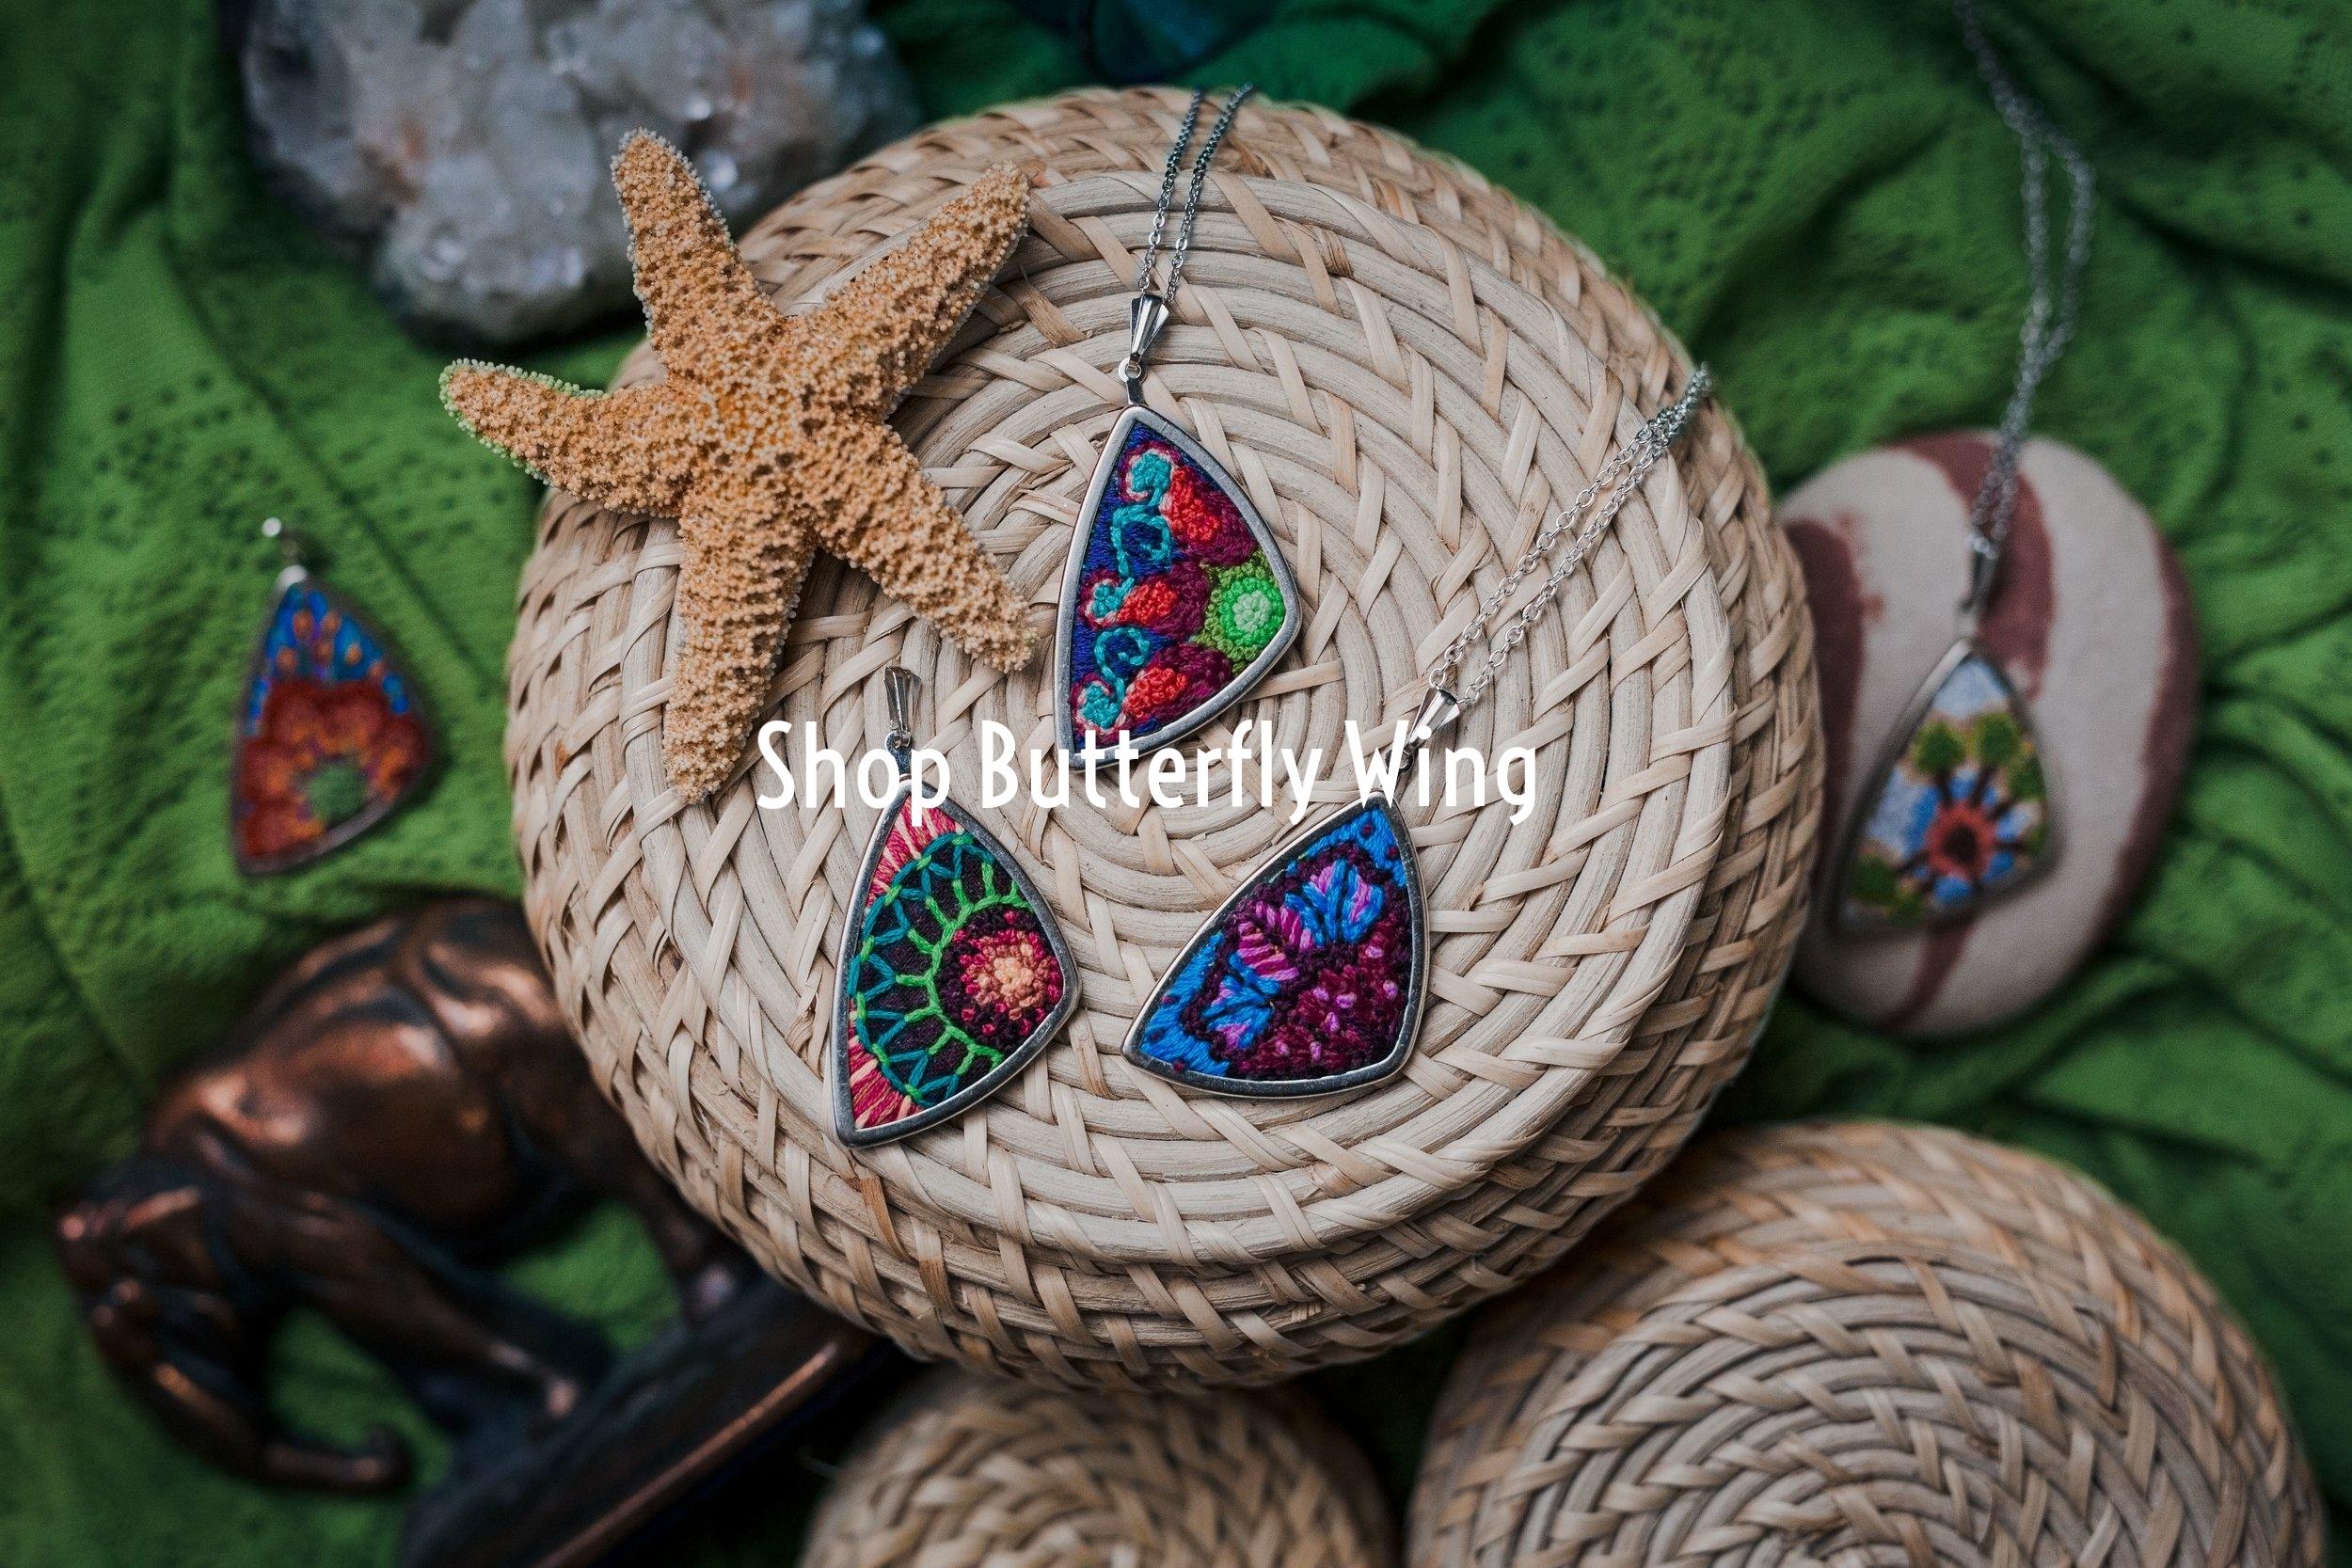 Shop Butterfly Wing